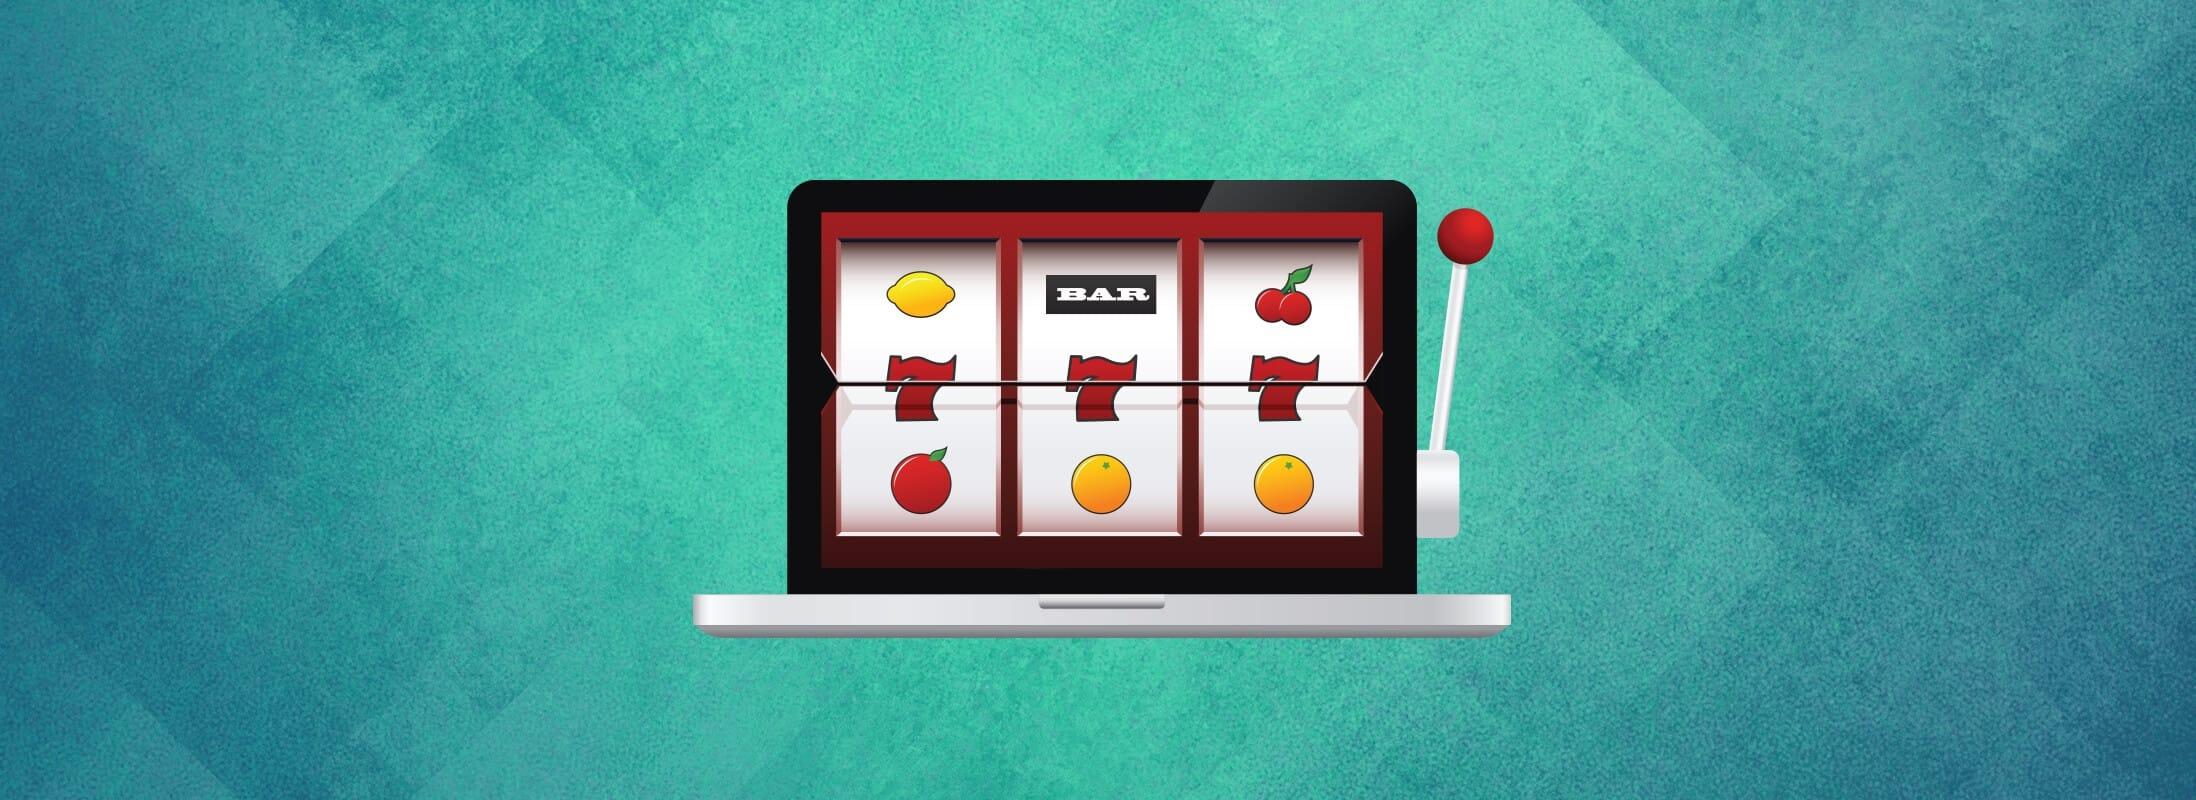 Pixie Slot Machine Game